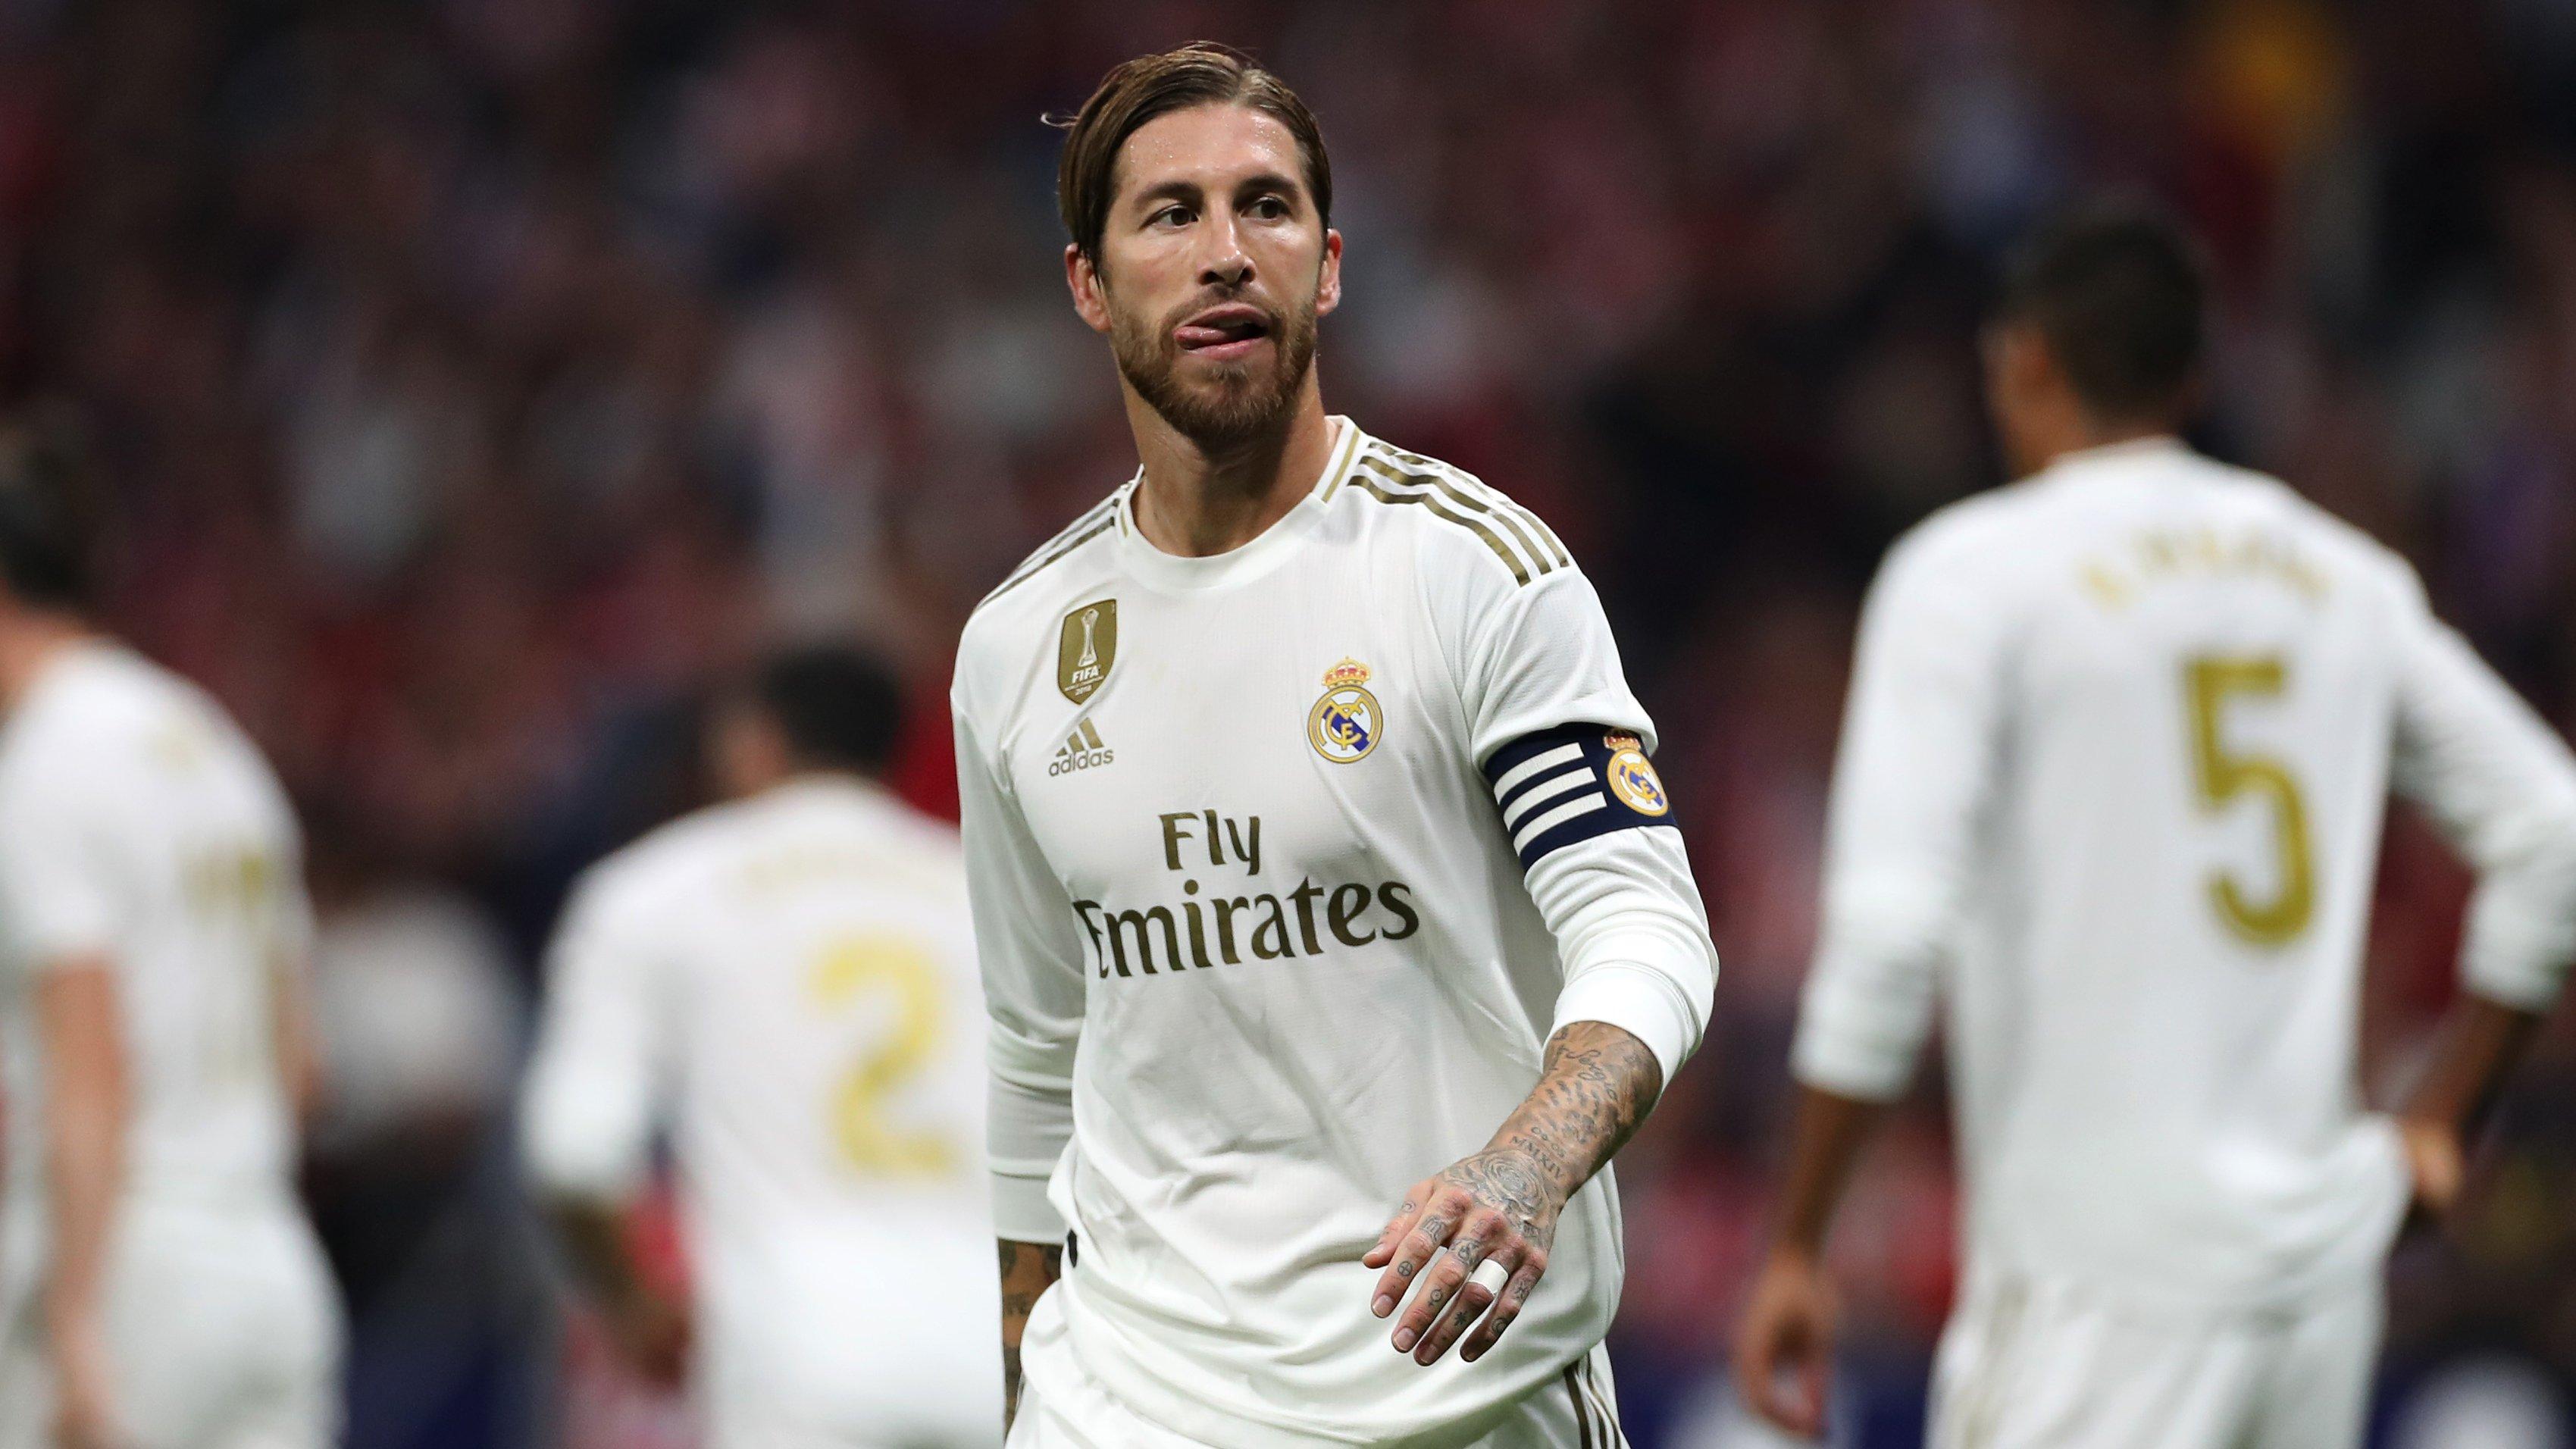 Real Madrid: Fans react to Sergio Ramos presentation - Bóng Đá